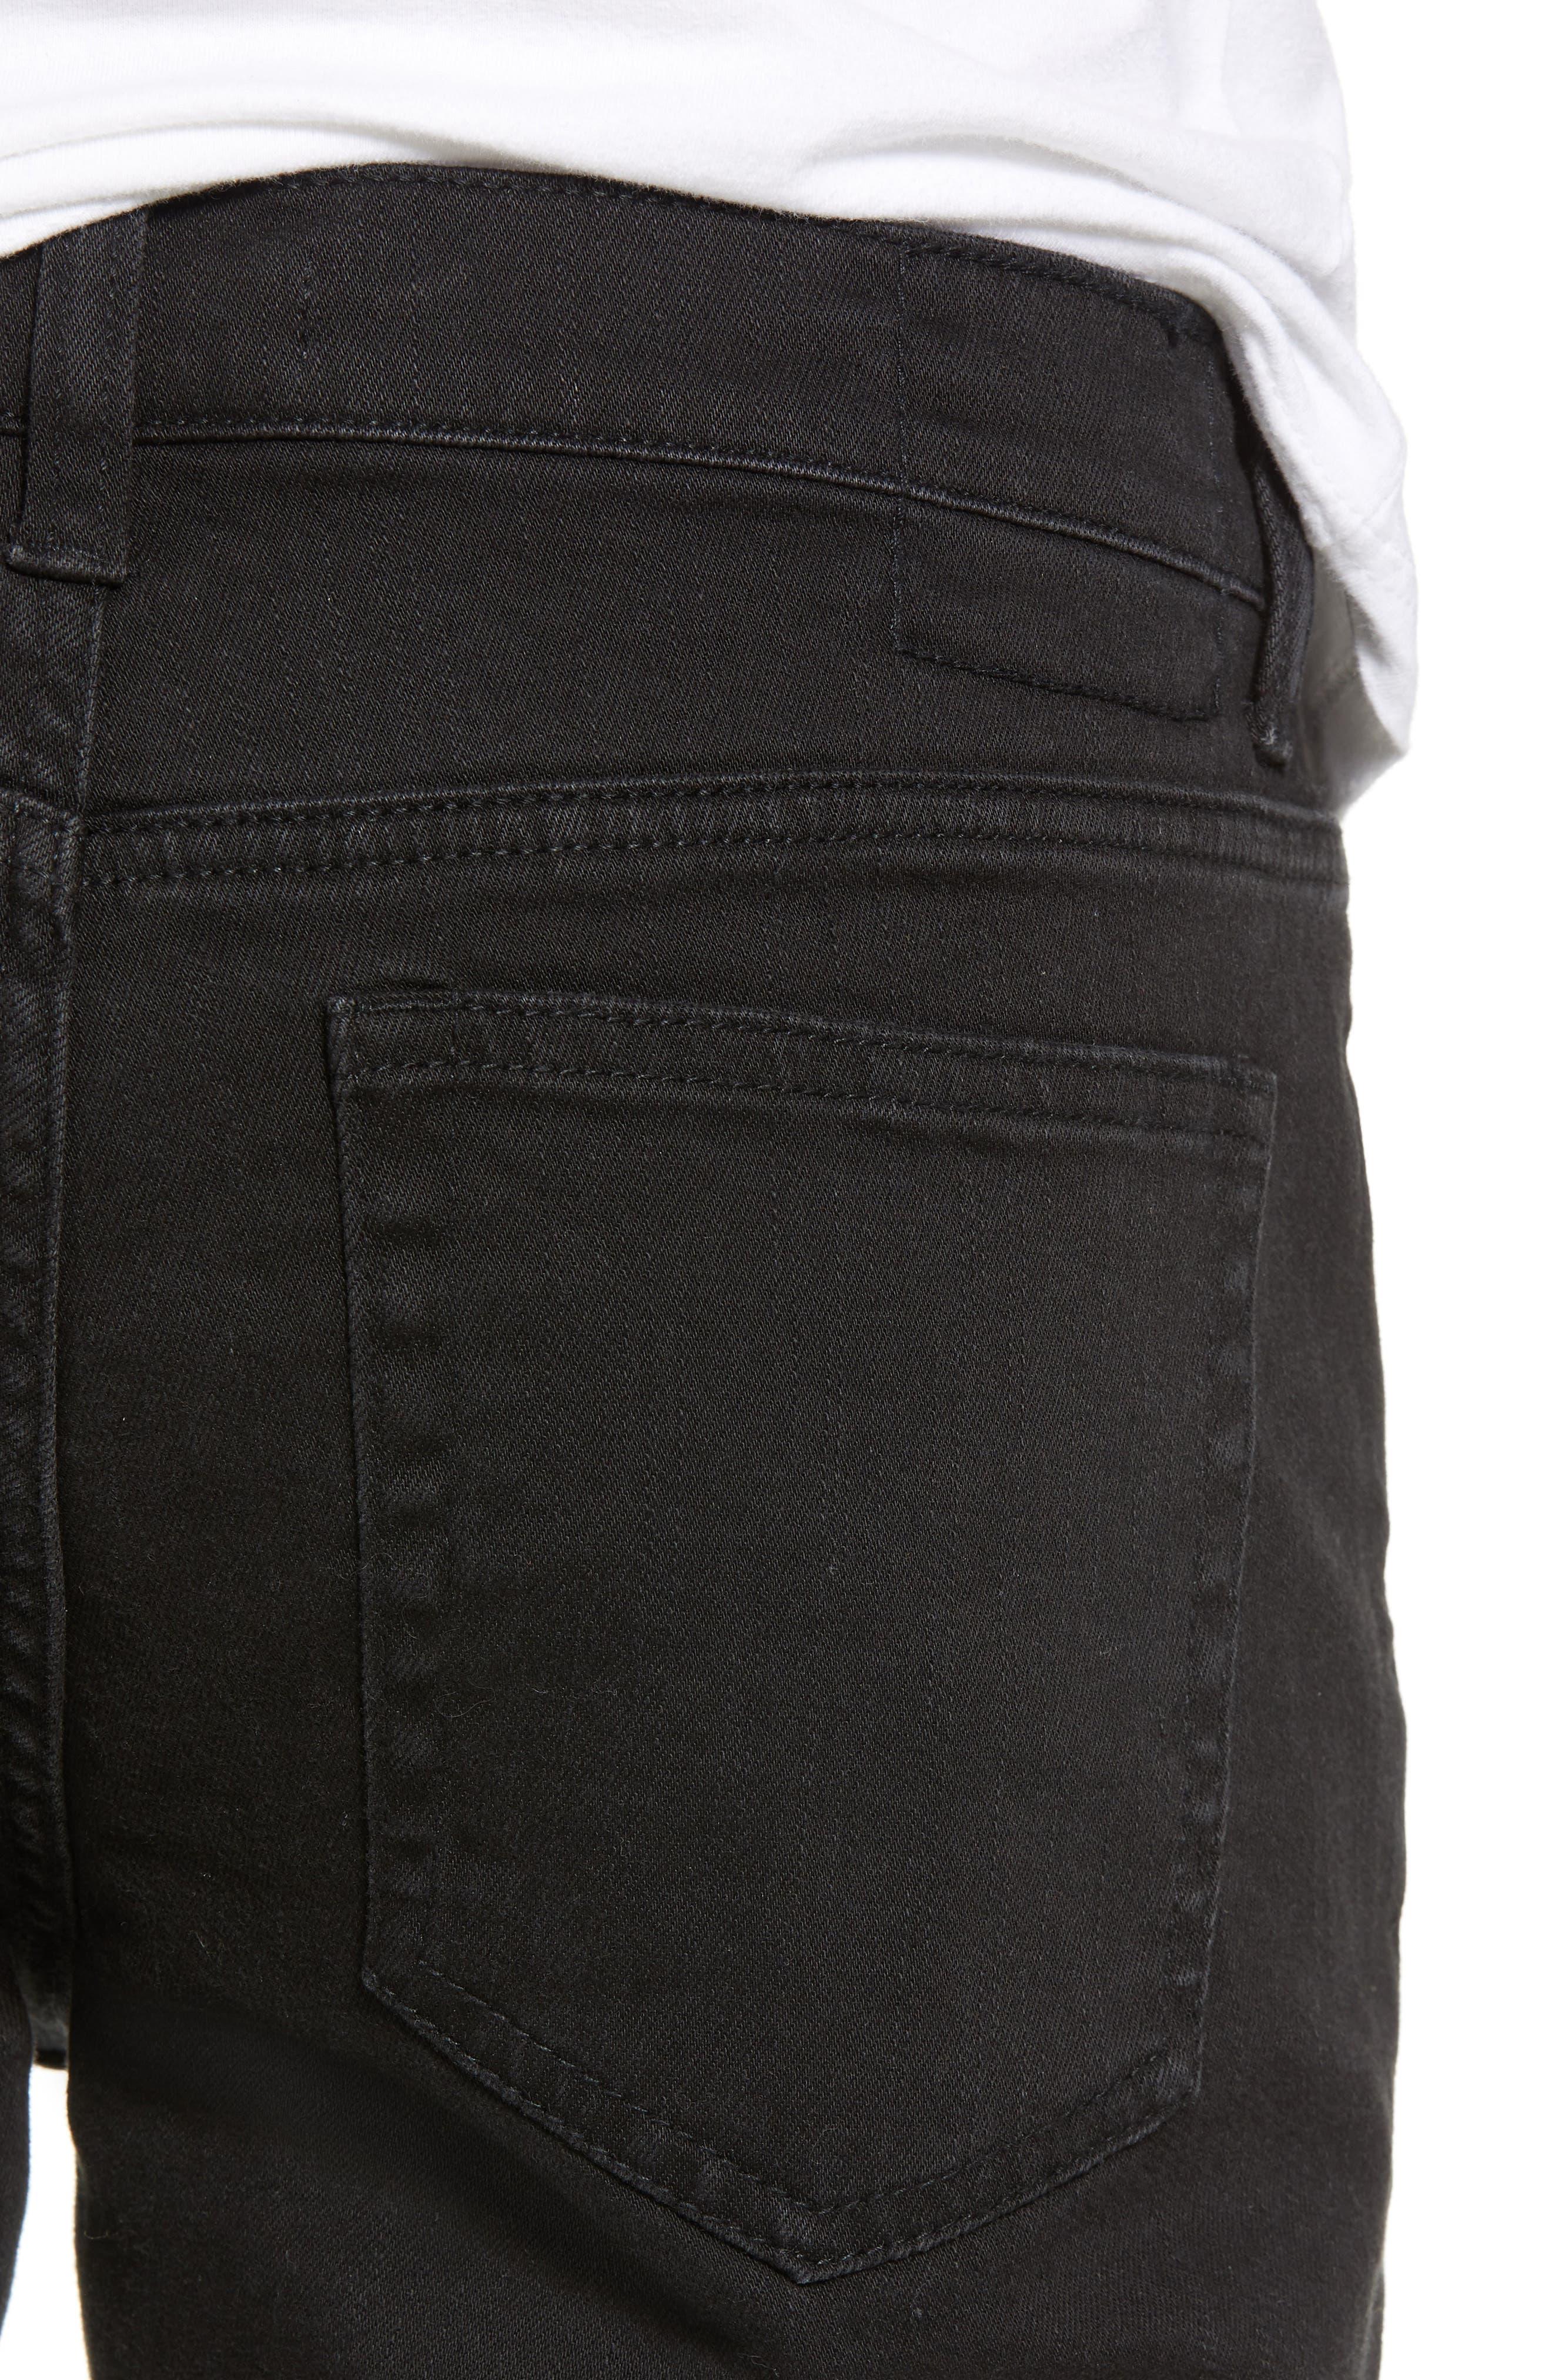 THE RAIL, Ripped Skinny Jeans, Alternate thumbnail 5, color, BLACK STONE WASH